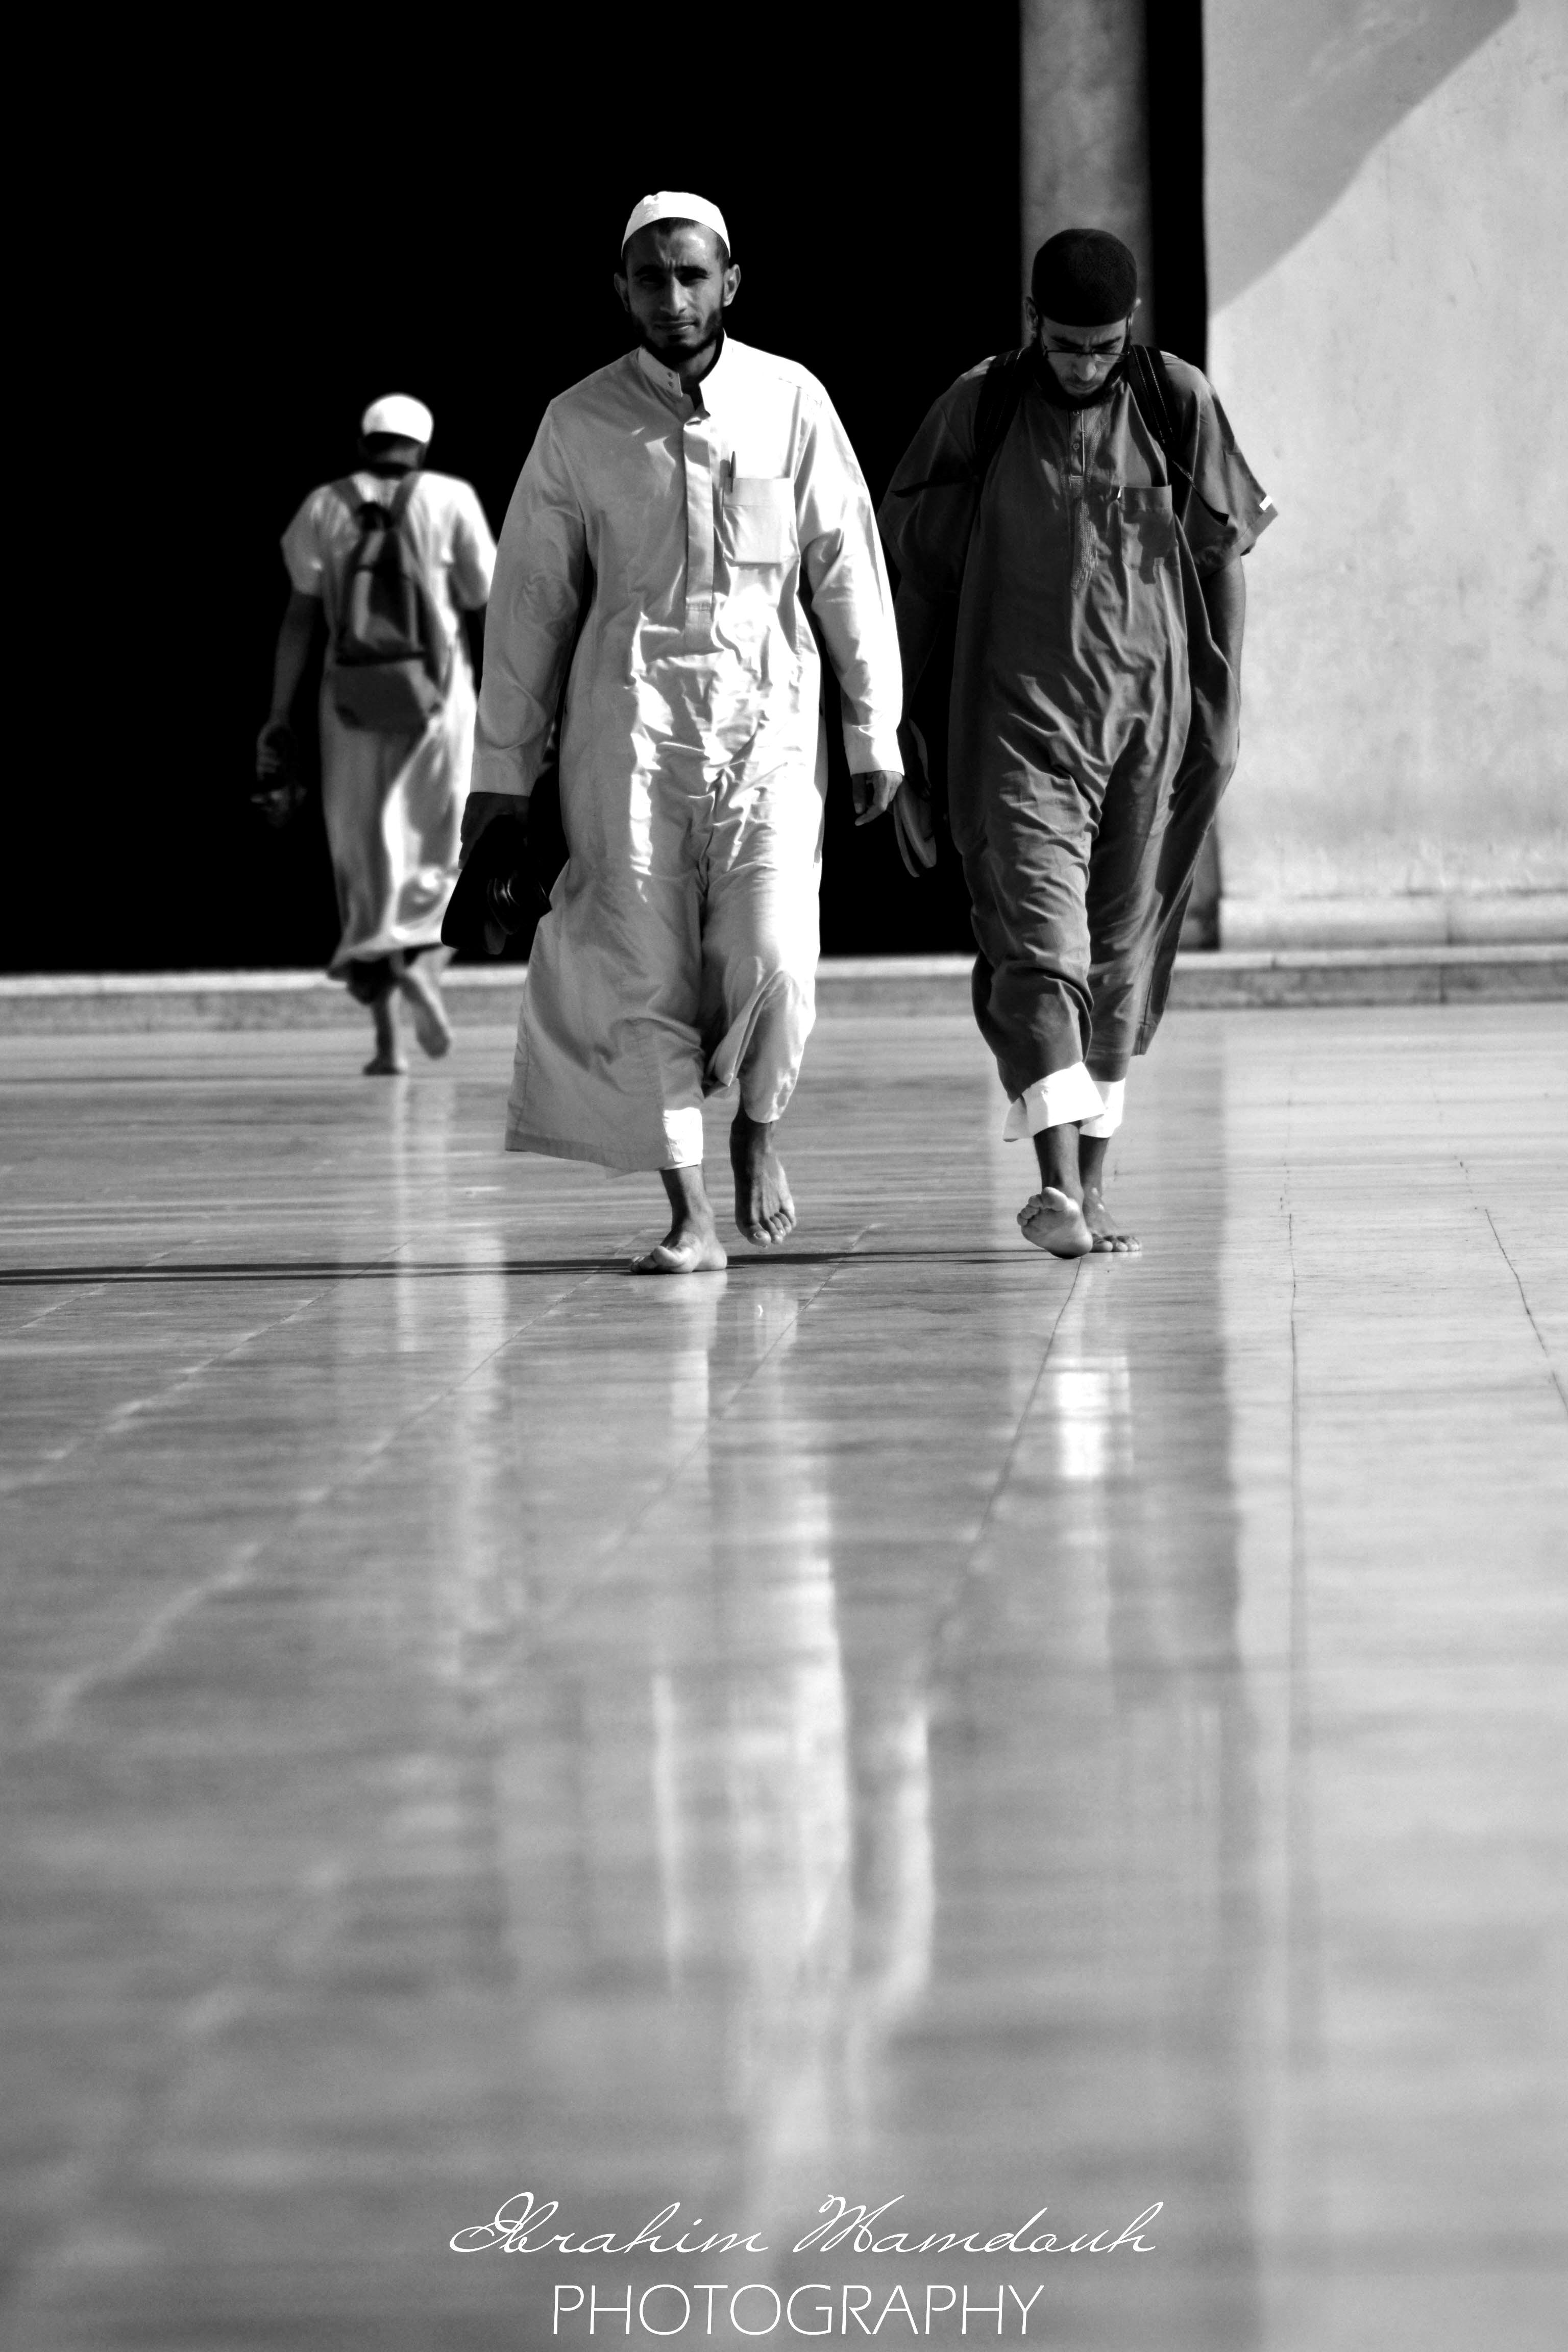 Muslim men by imamdouhphotography on deviantart